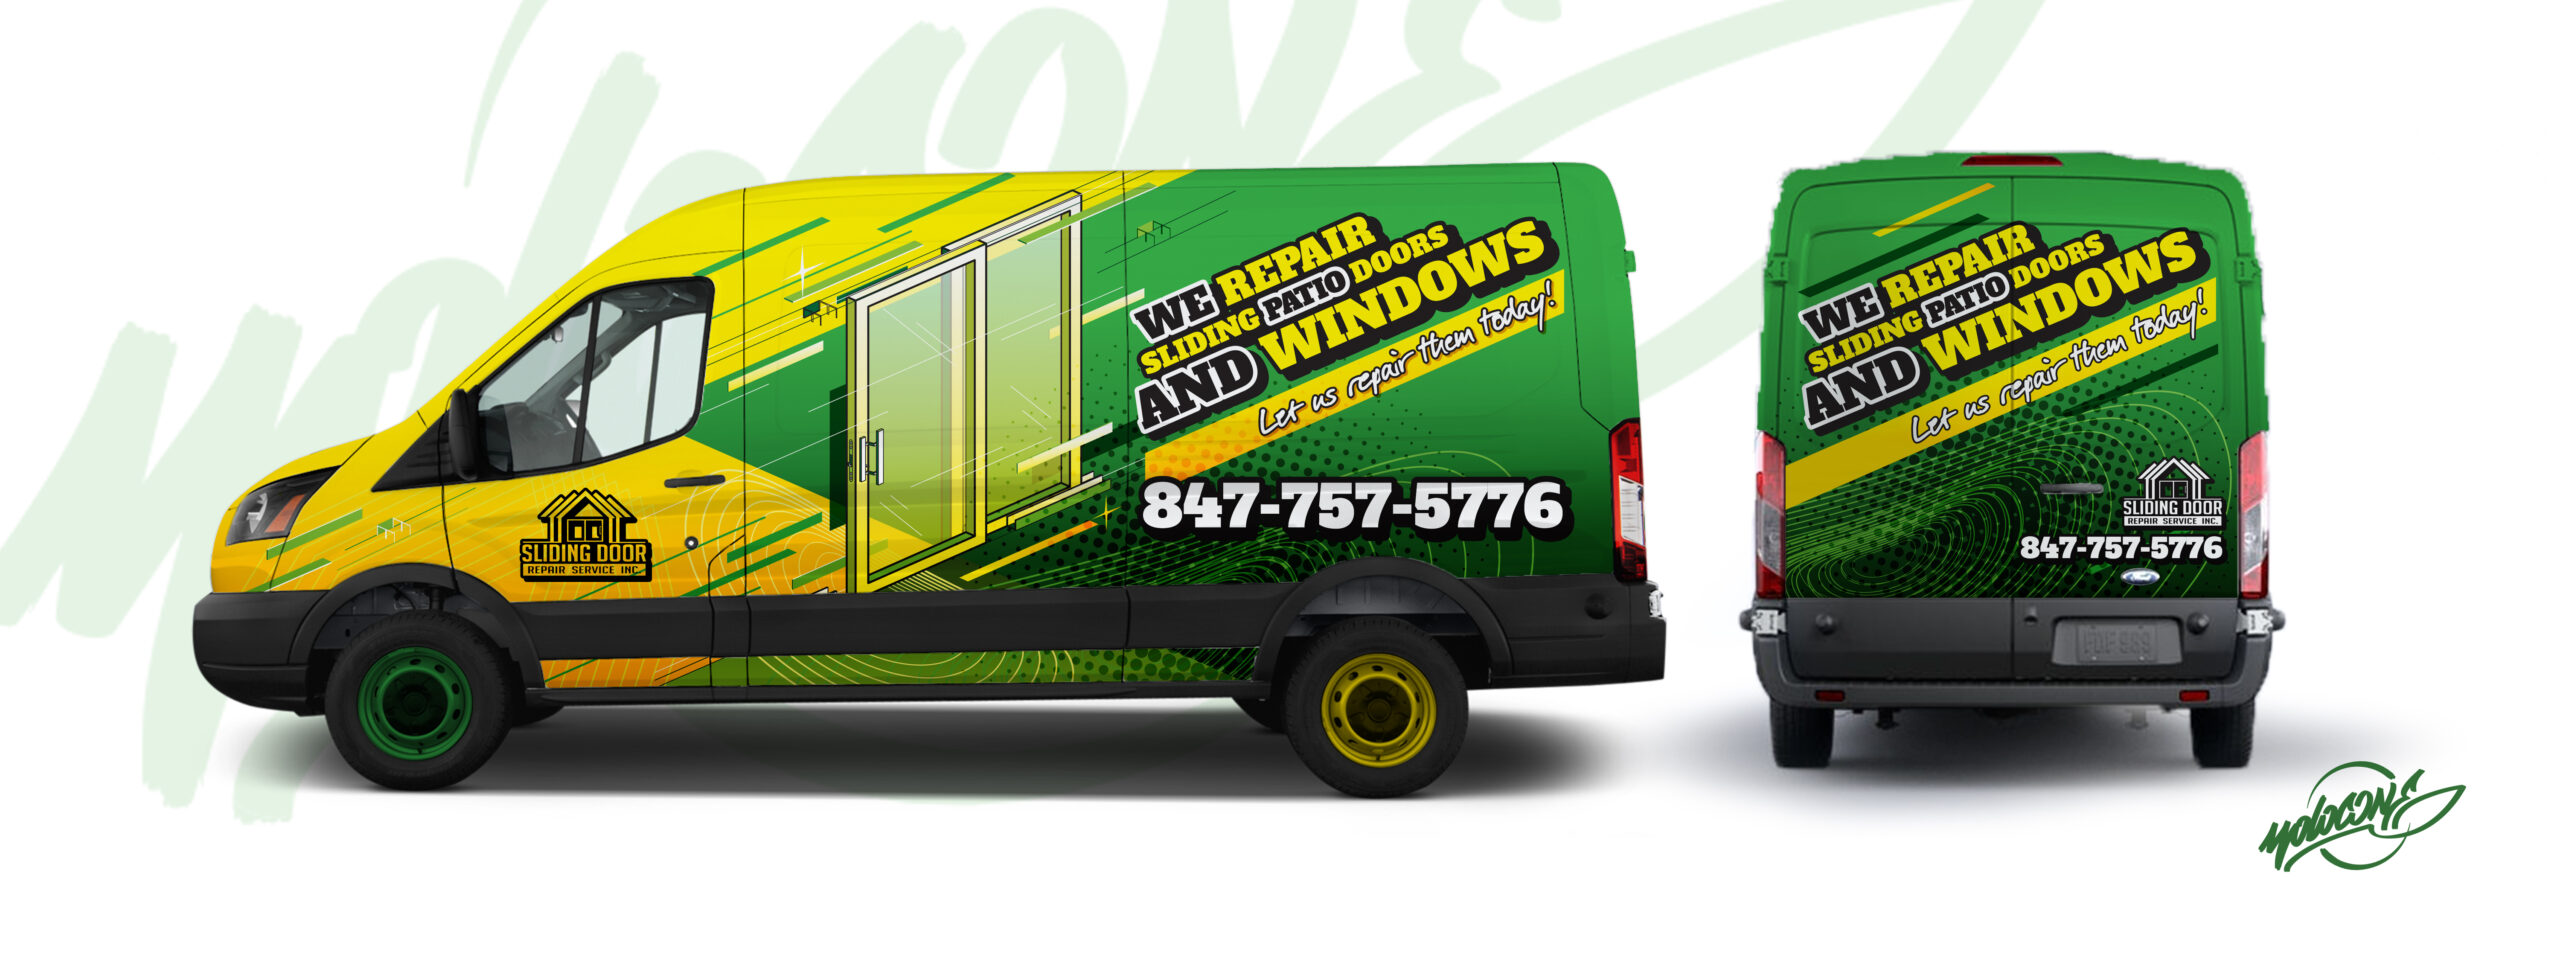 windows repair - branding